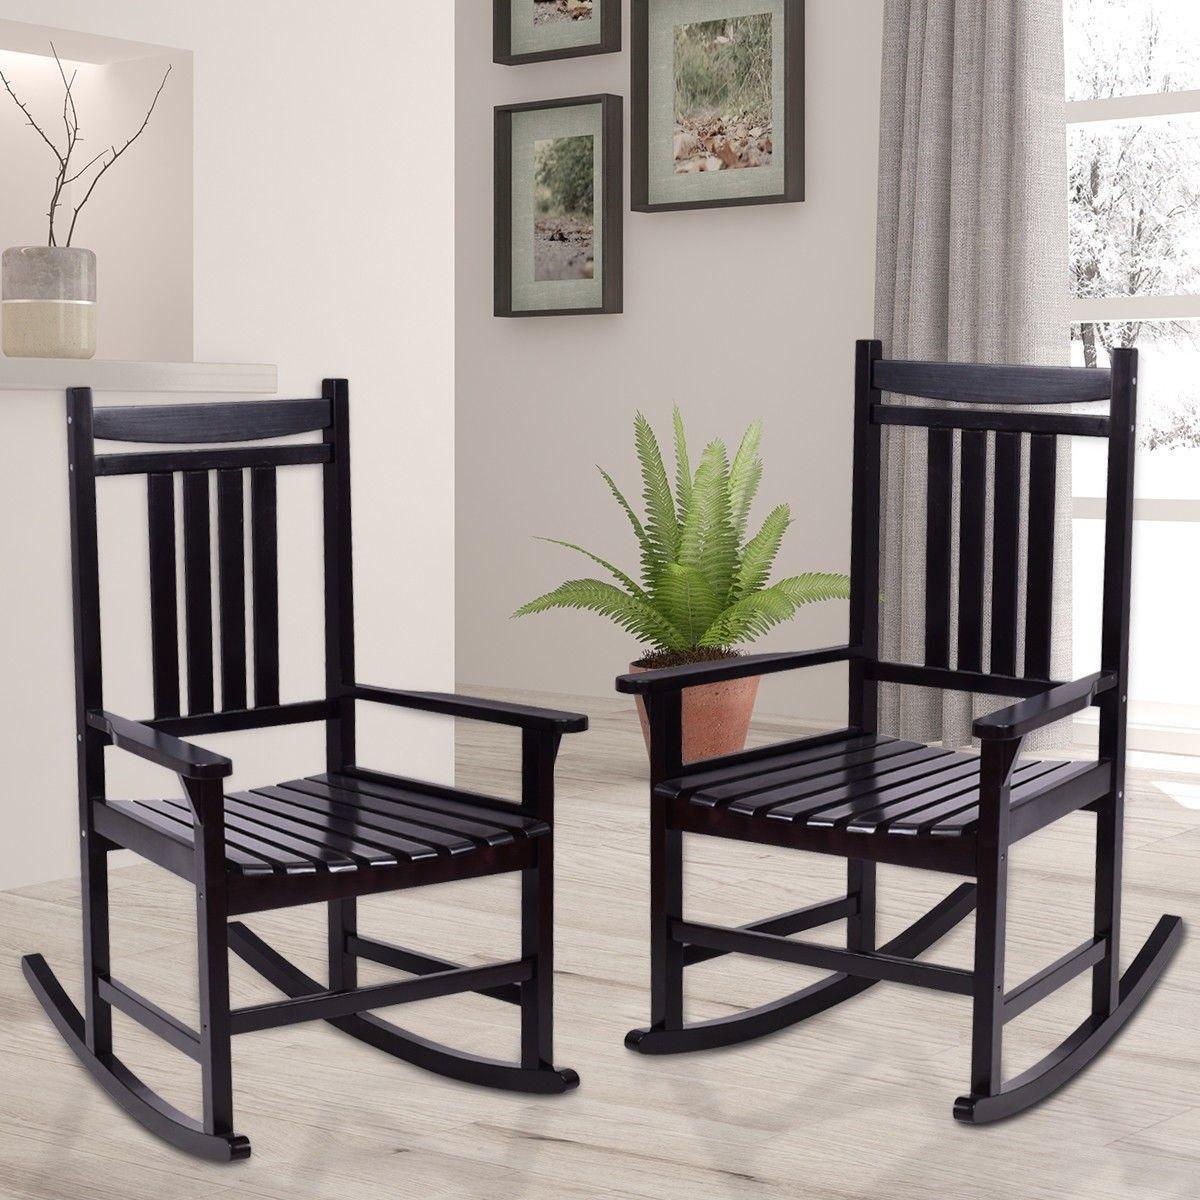 Set of 2 Indoor Outdoor Porch Wood Rocking Chair Rocking